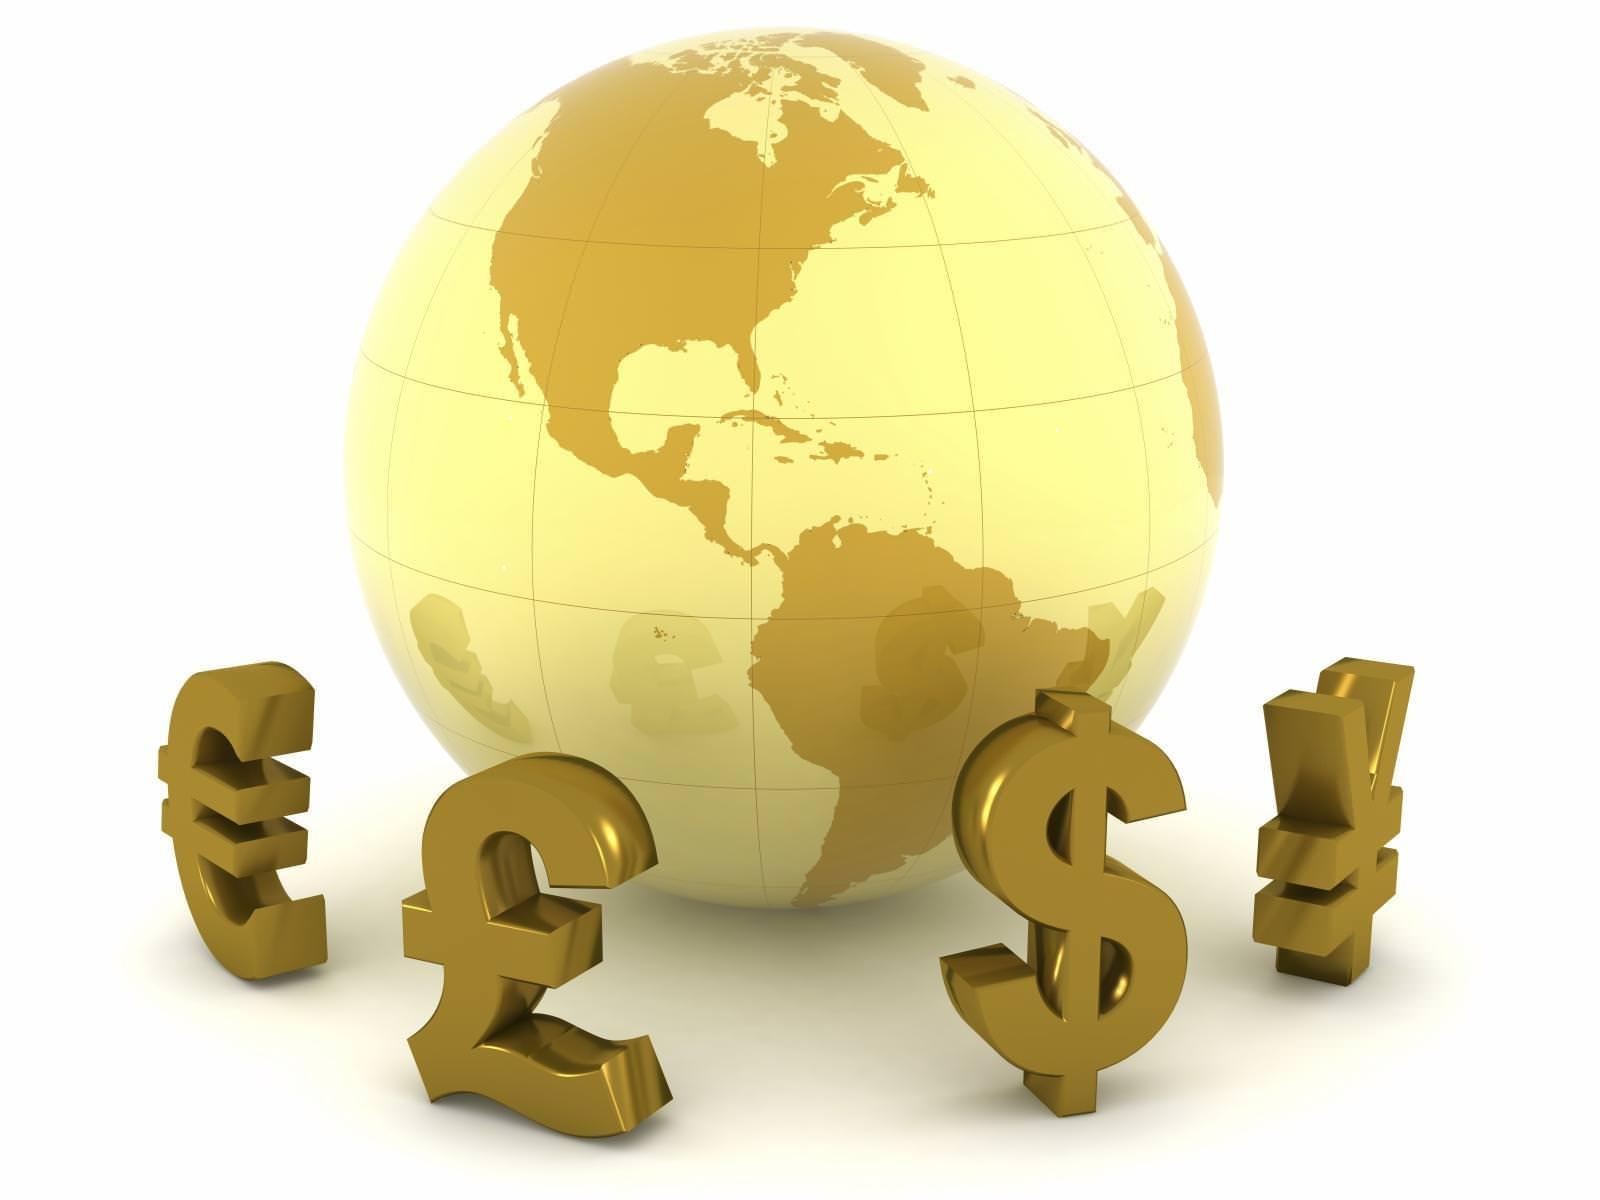 банковская гарантия на возврат аванса образец